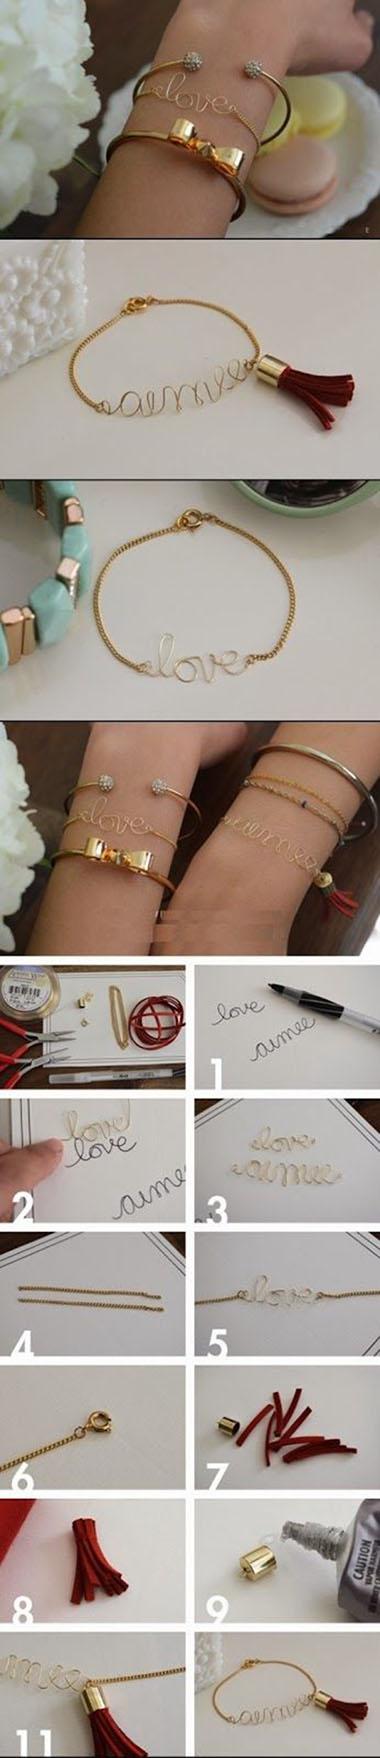 DIY Word Bracelet11